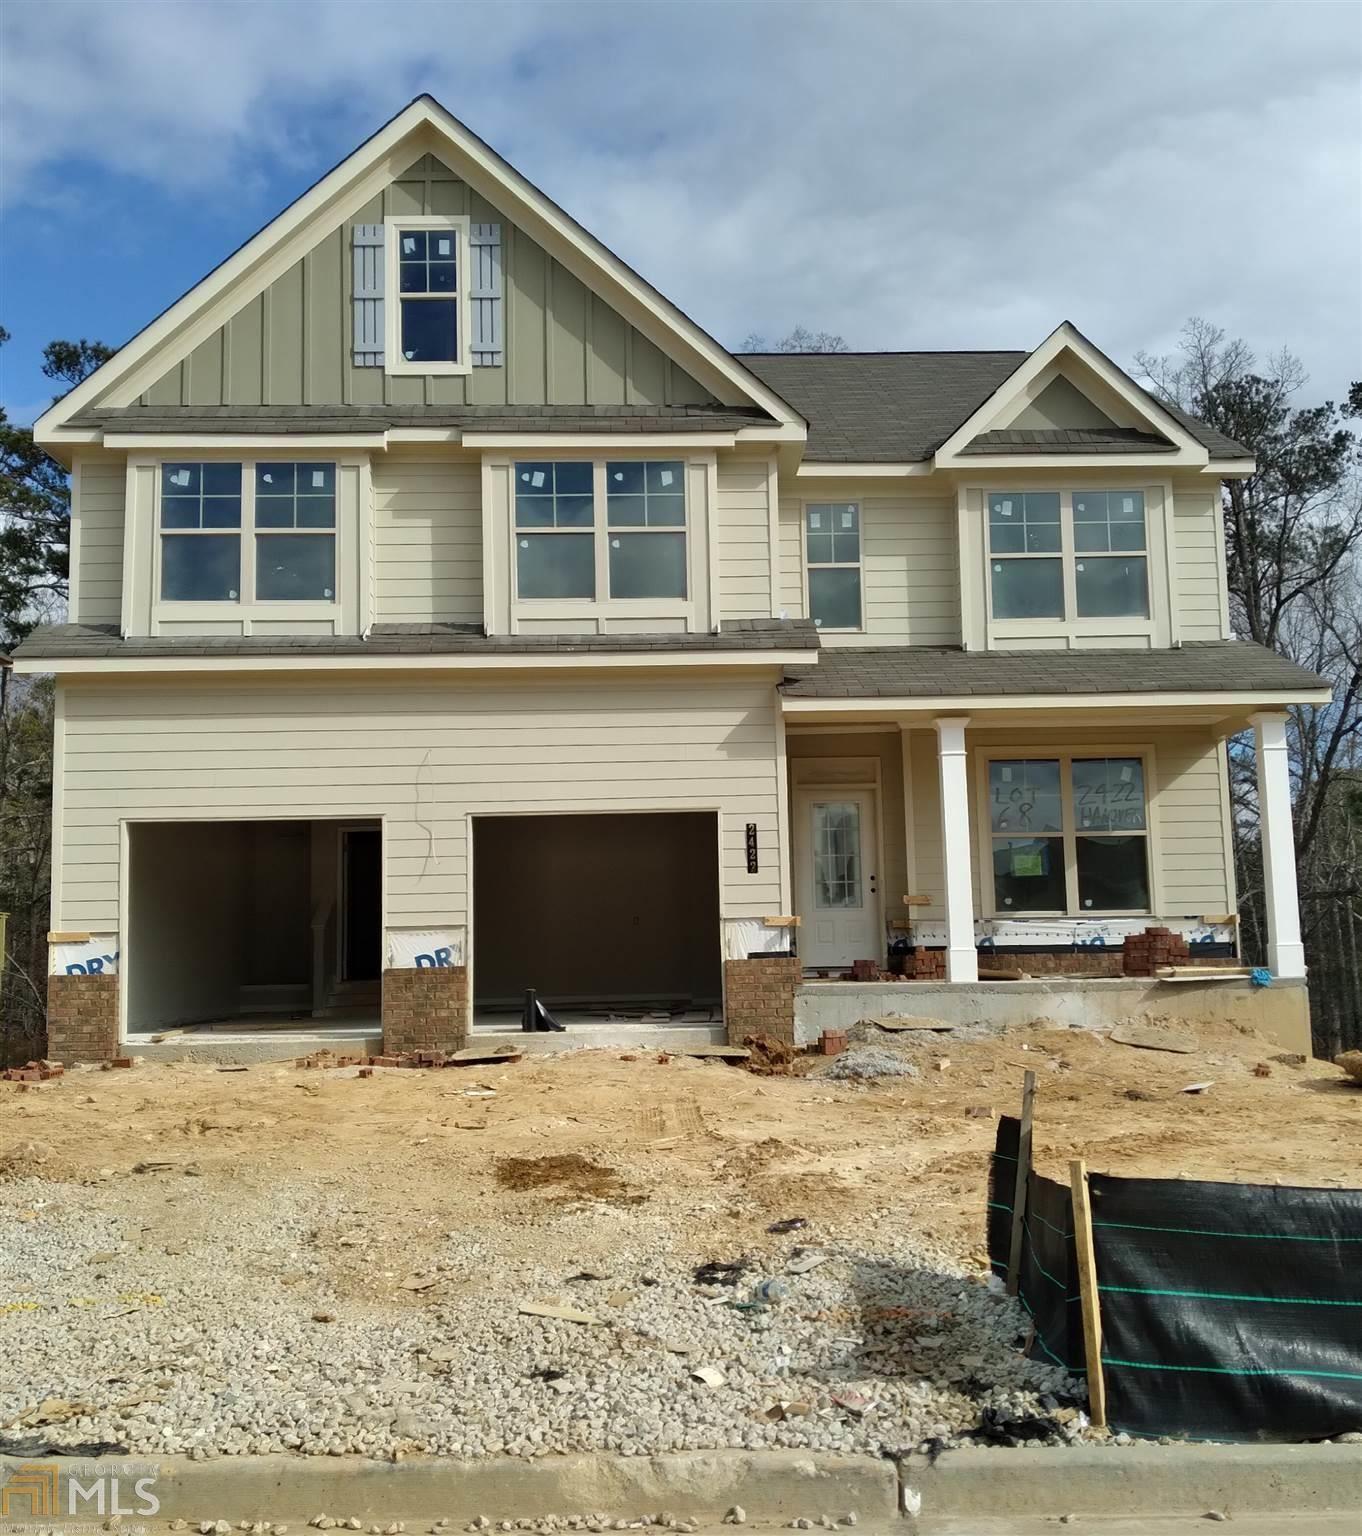 2422 Hanover Woods Rd, Lithonia, GA 30058 - MLS#: 8647548